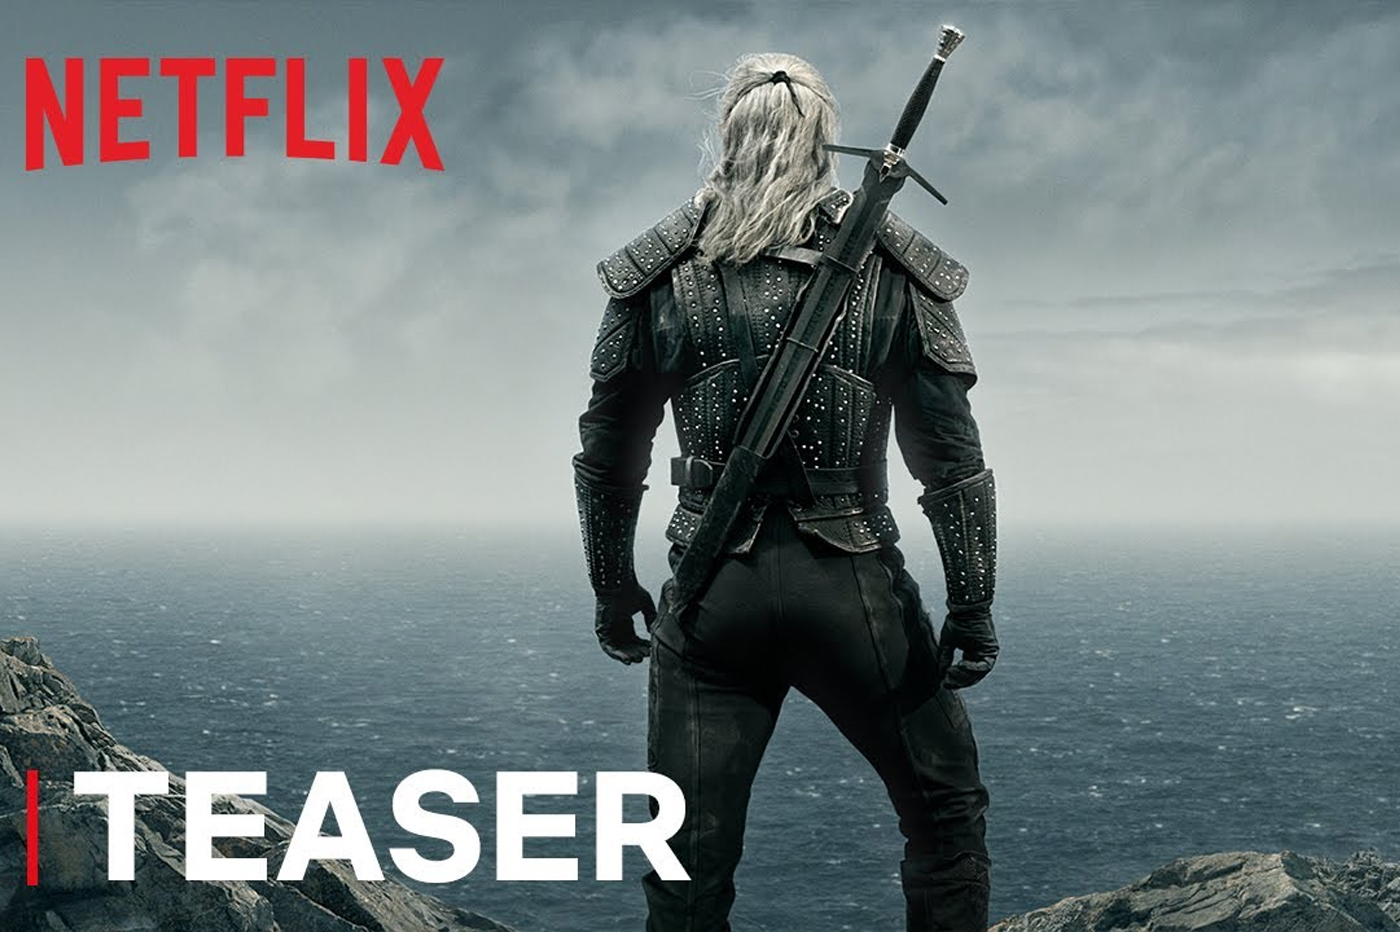 Premier teaser The Witcher Netflix